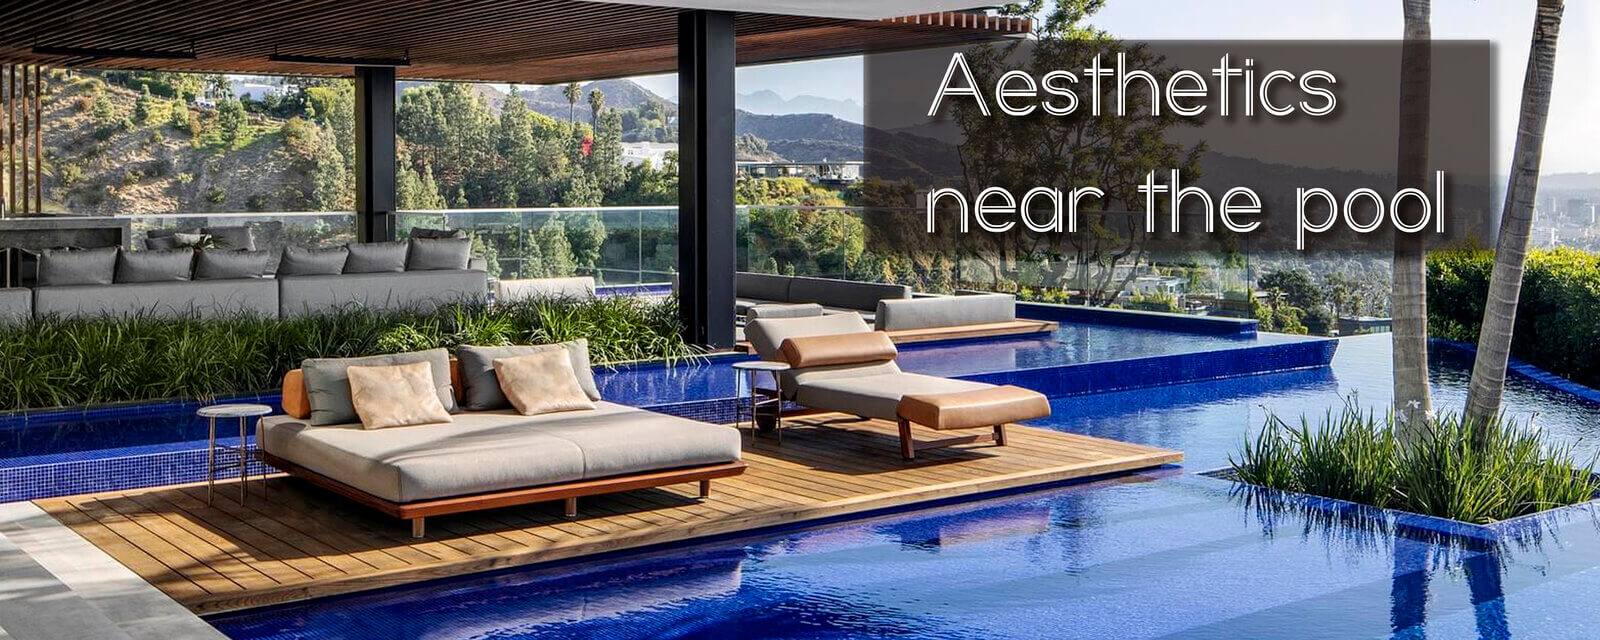 Aesthetics near the Pool